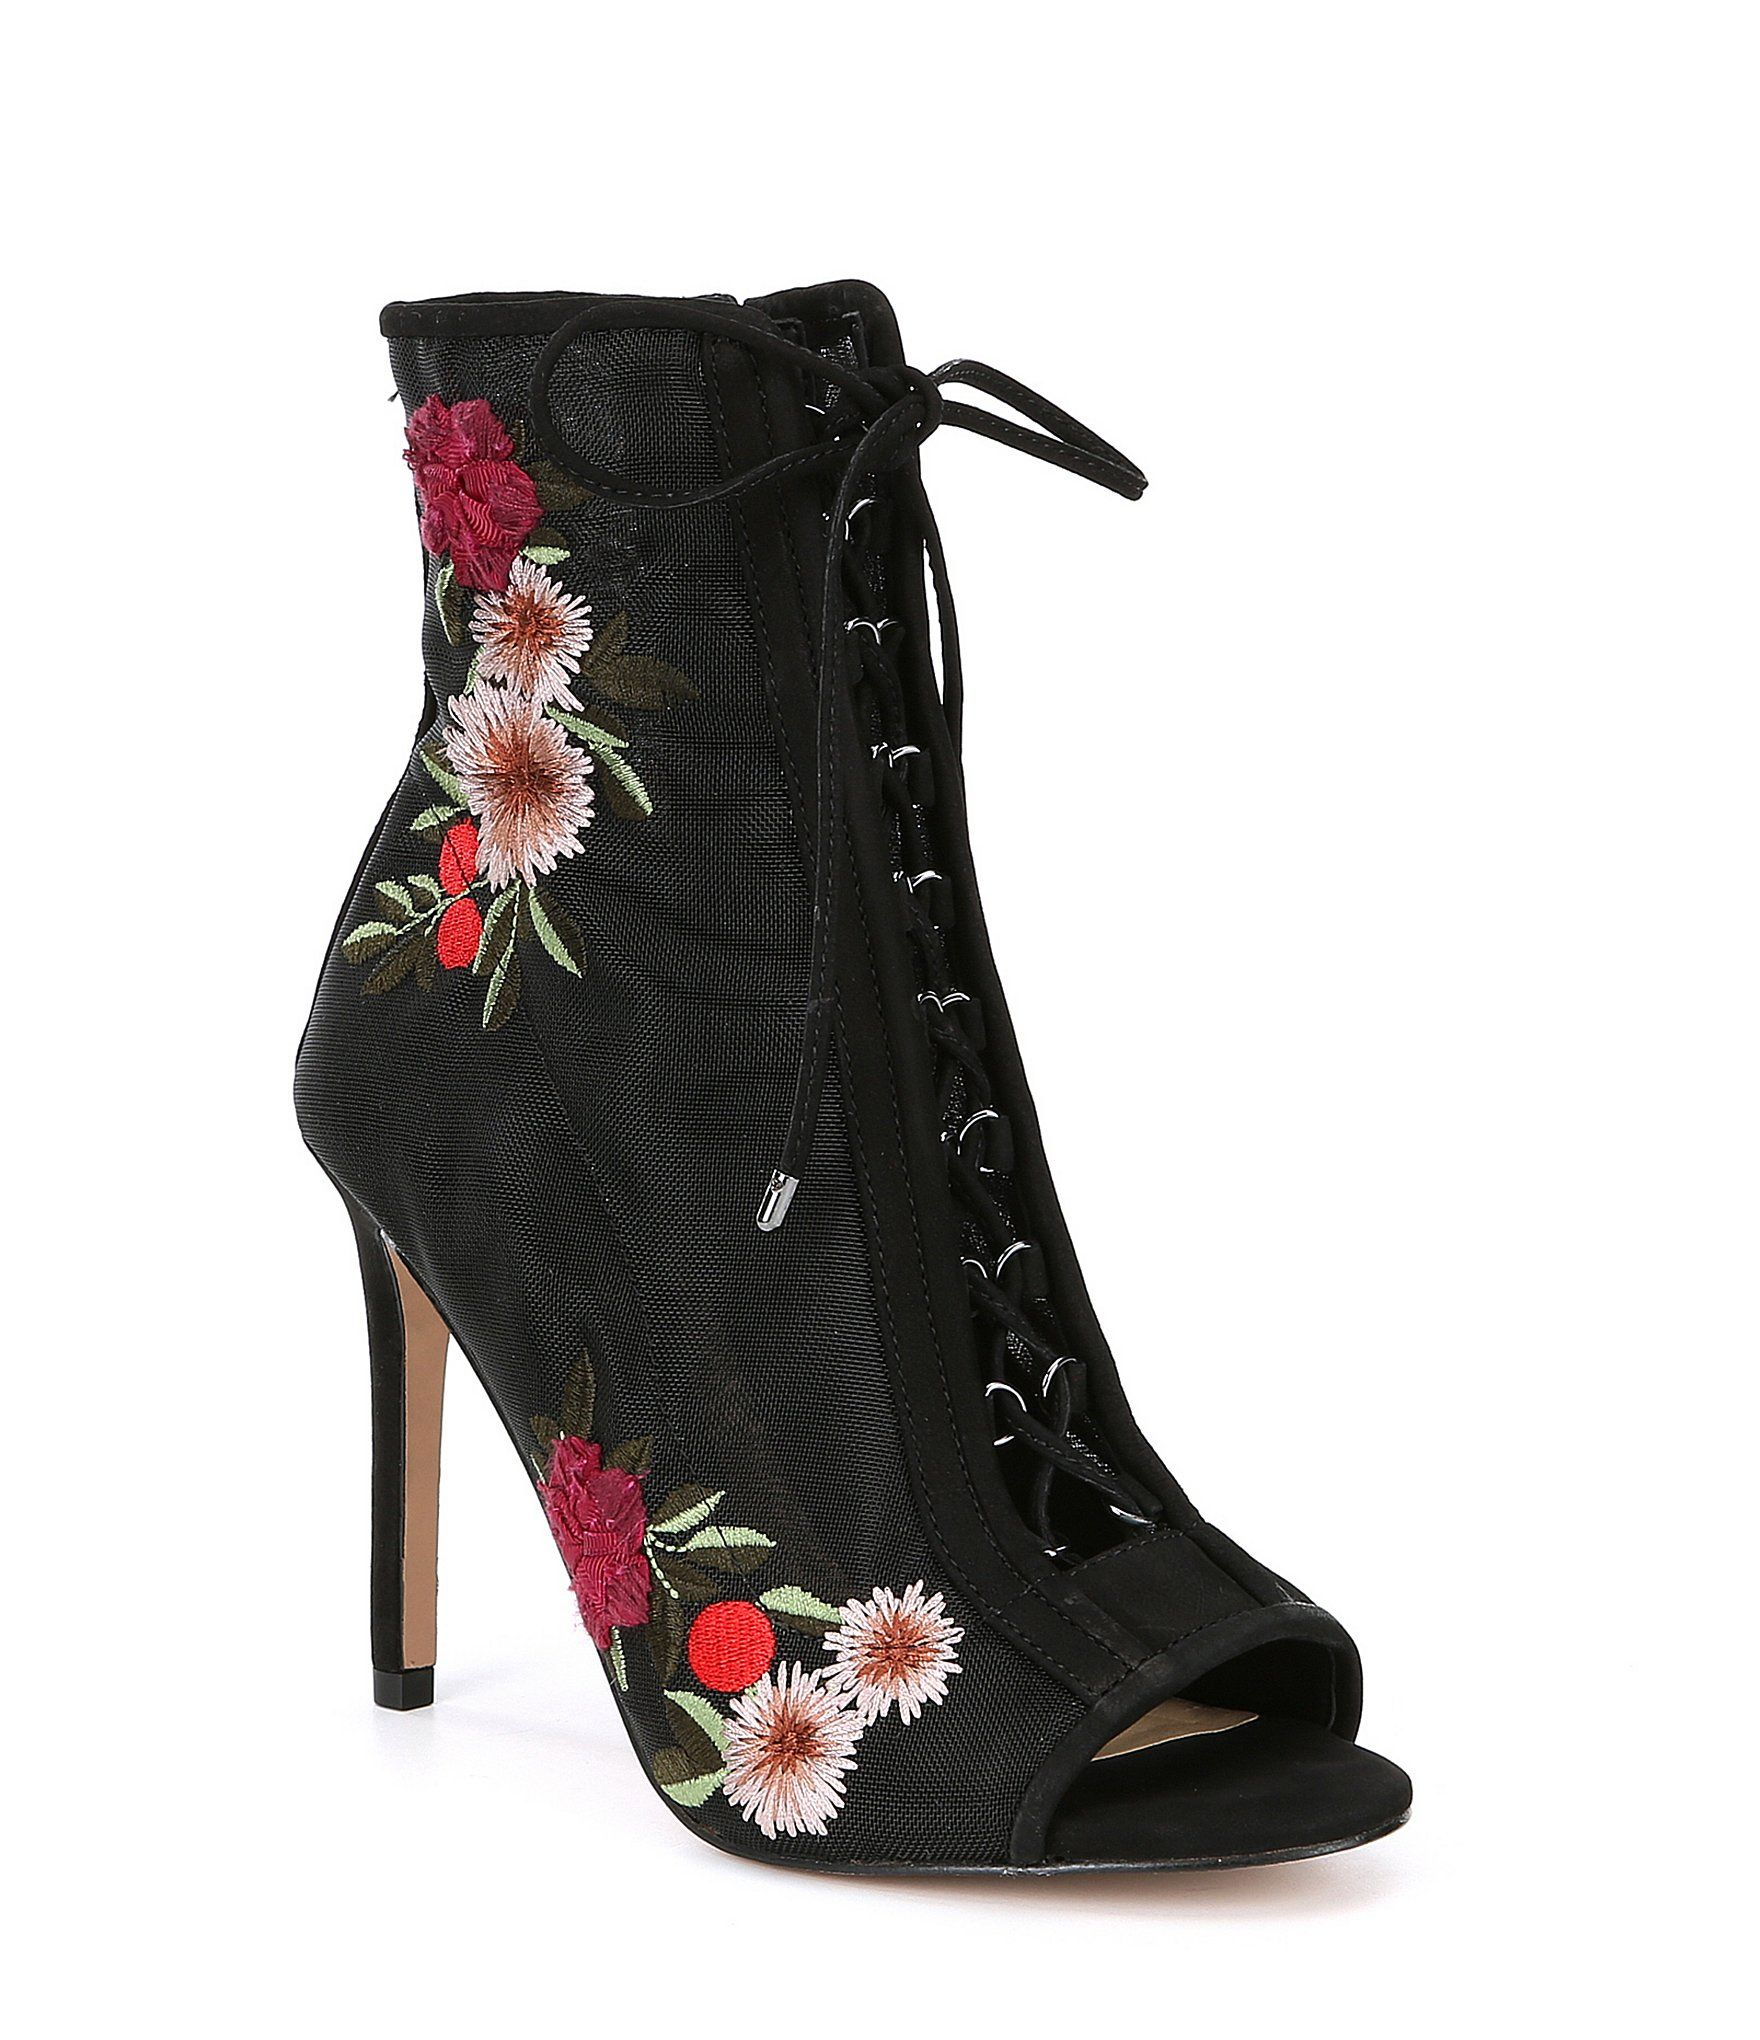 3080dd2d6d1 Gianni Bini Janan Floral Mesh Laceup Shooties #Dillards | Shoes in ...